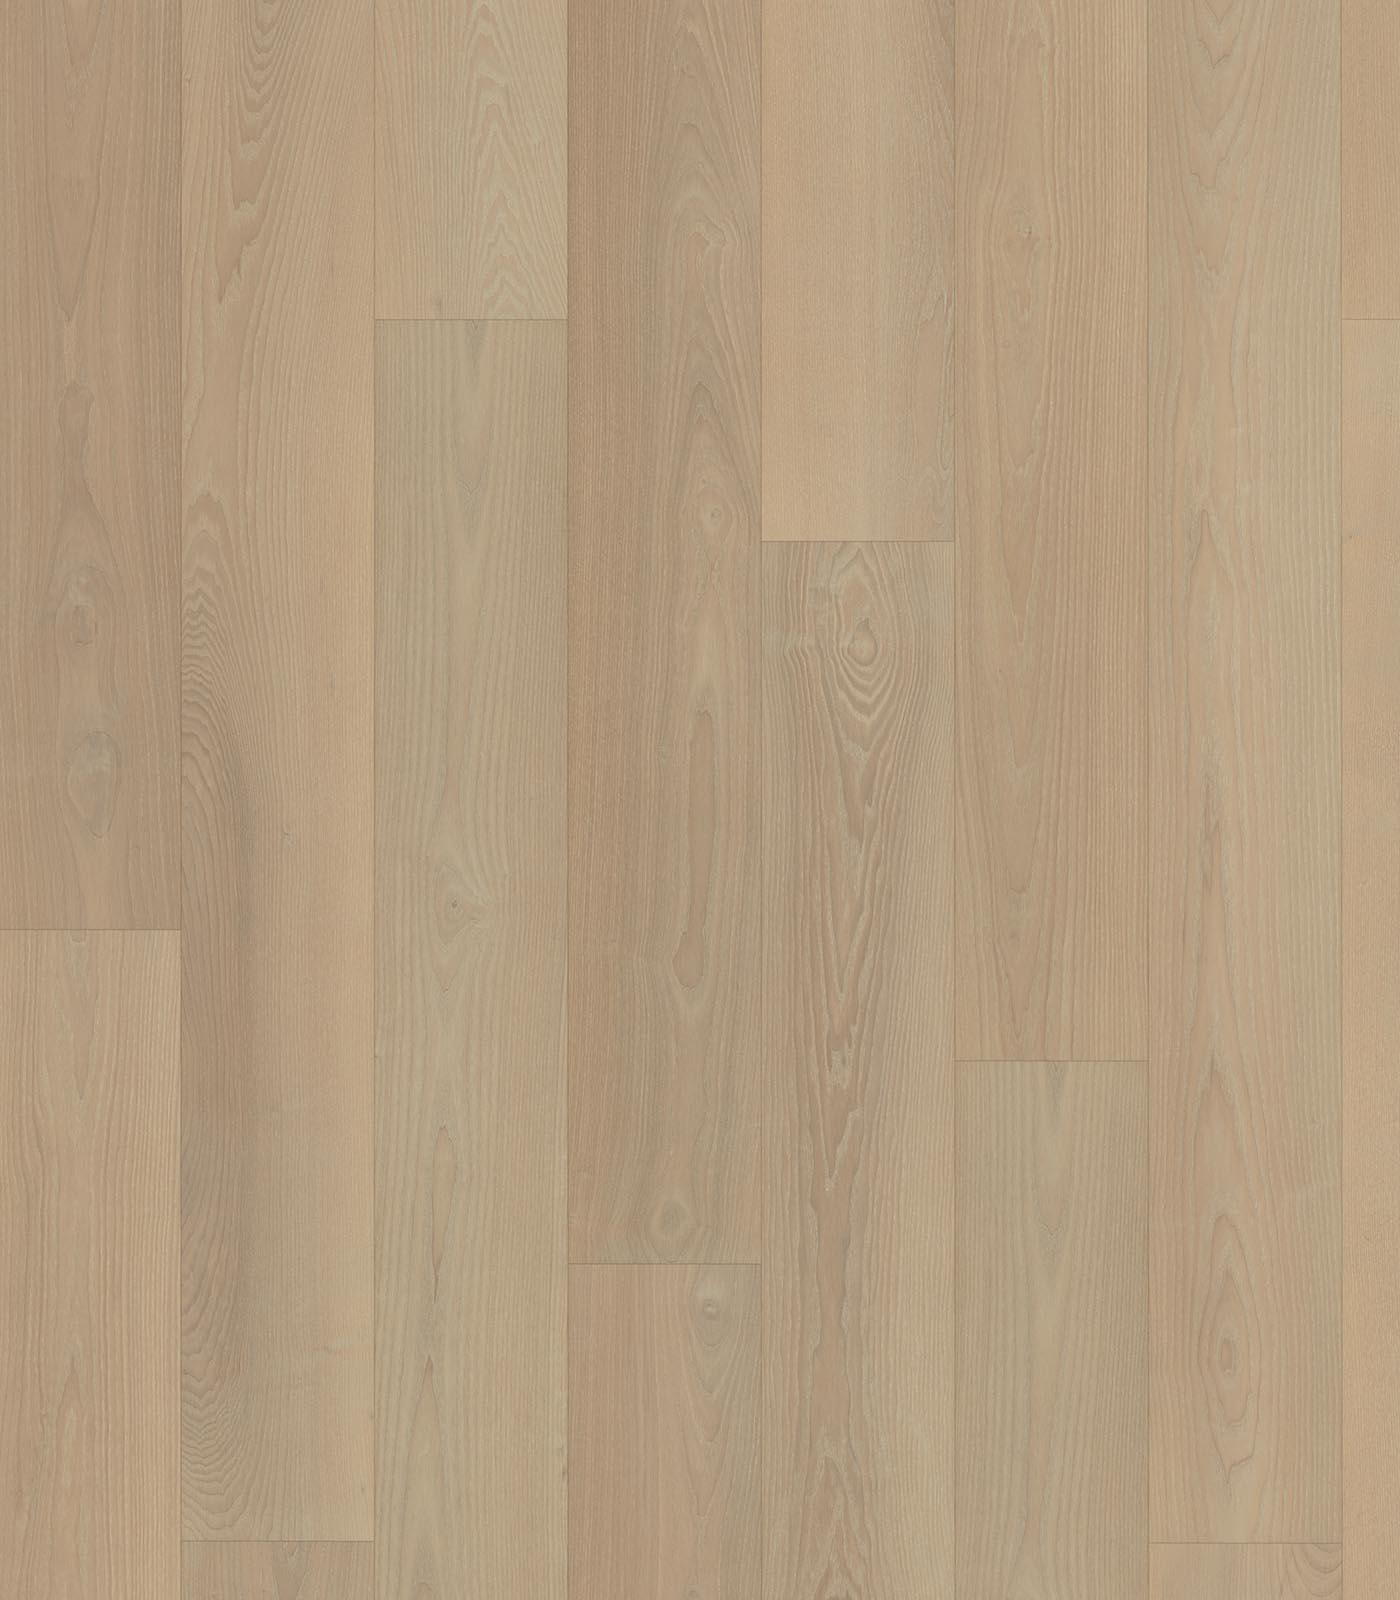 Seville-European Ash floors-After Oak Collection - Flat